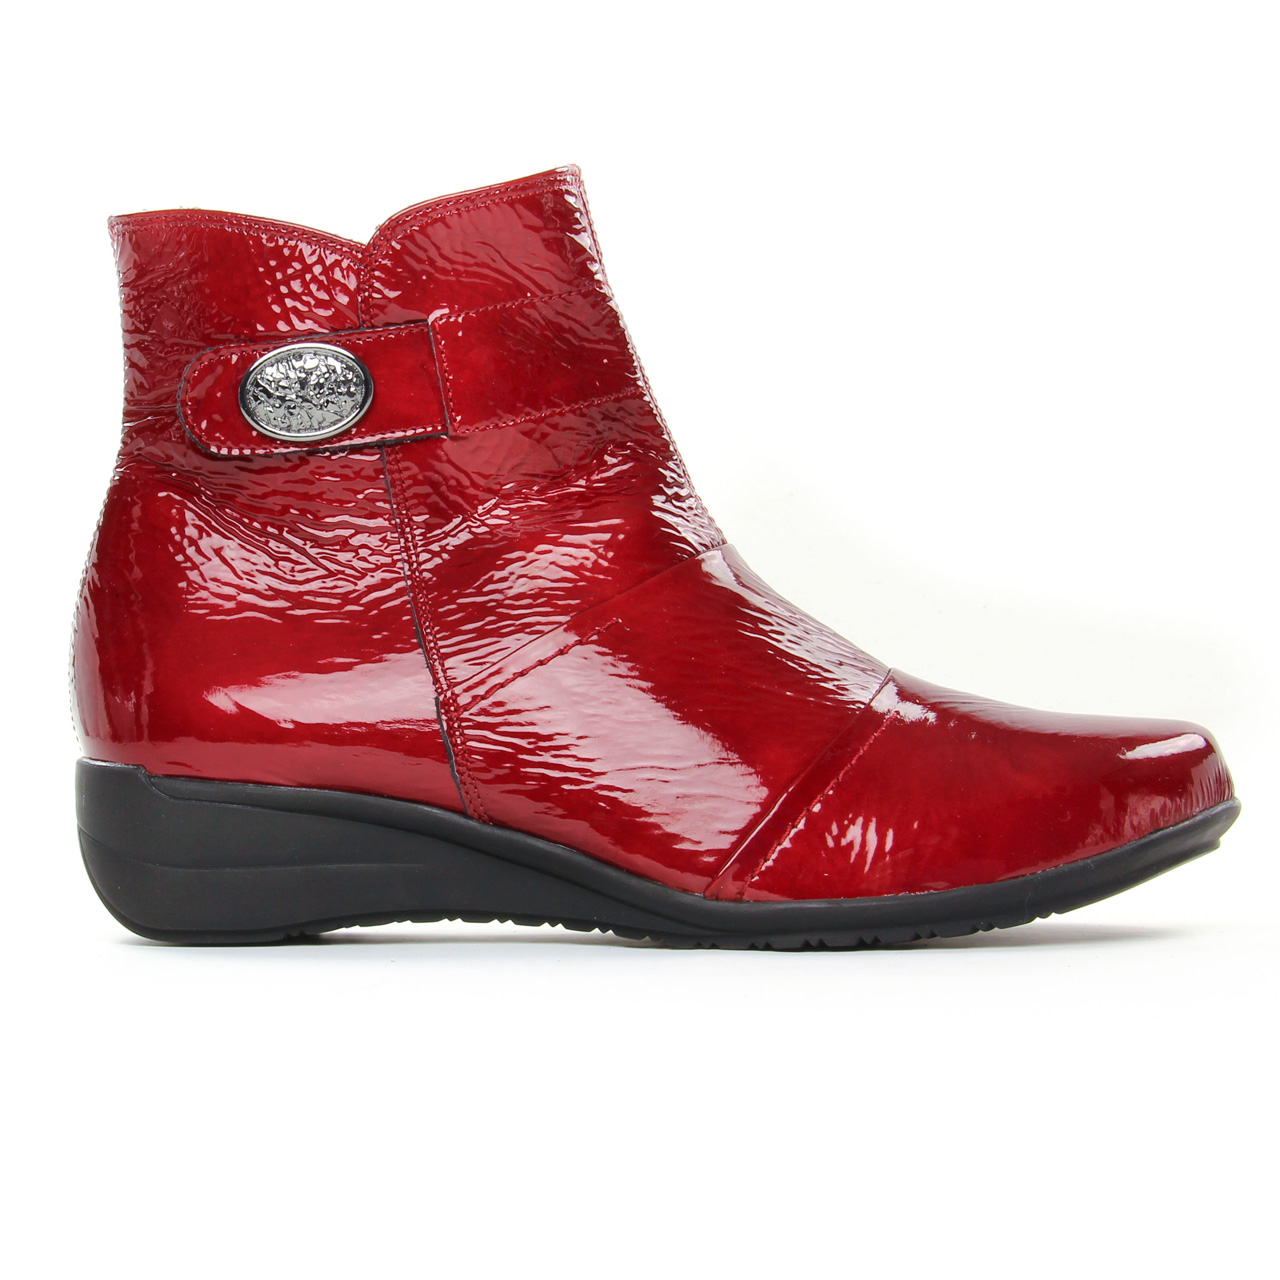 bottines cuir verni rouge femme